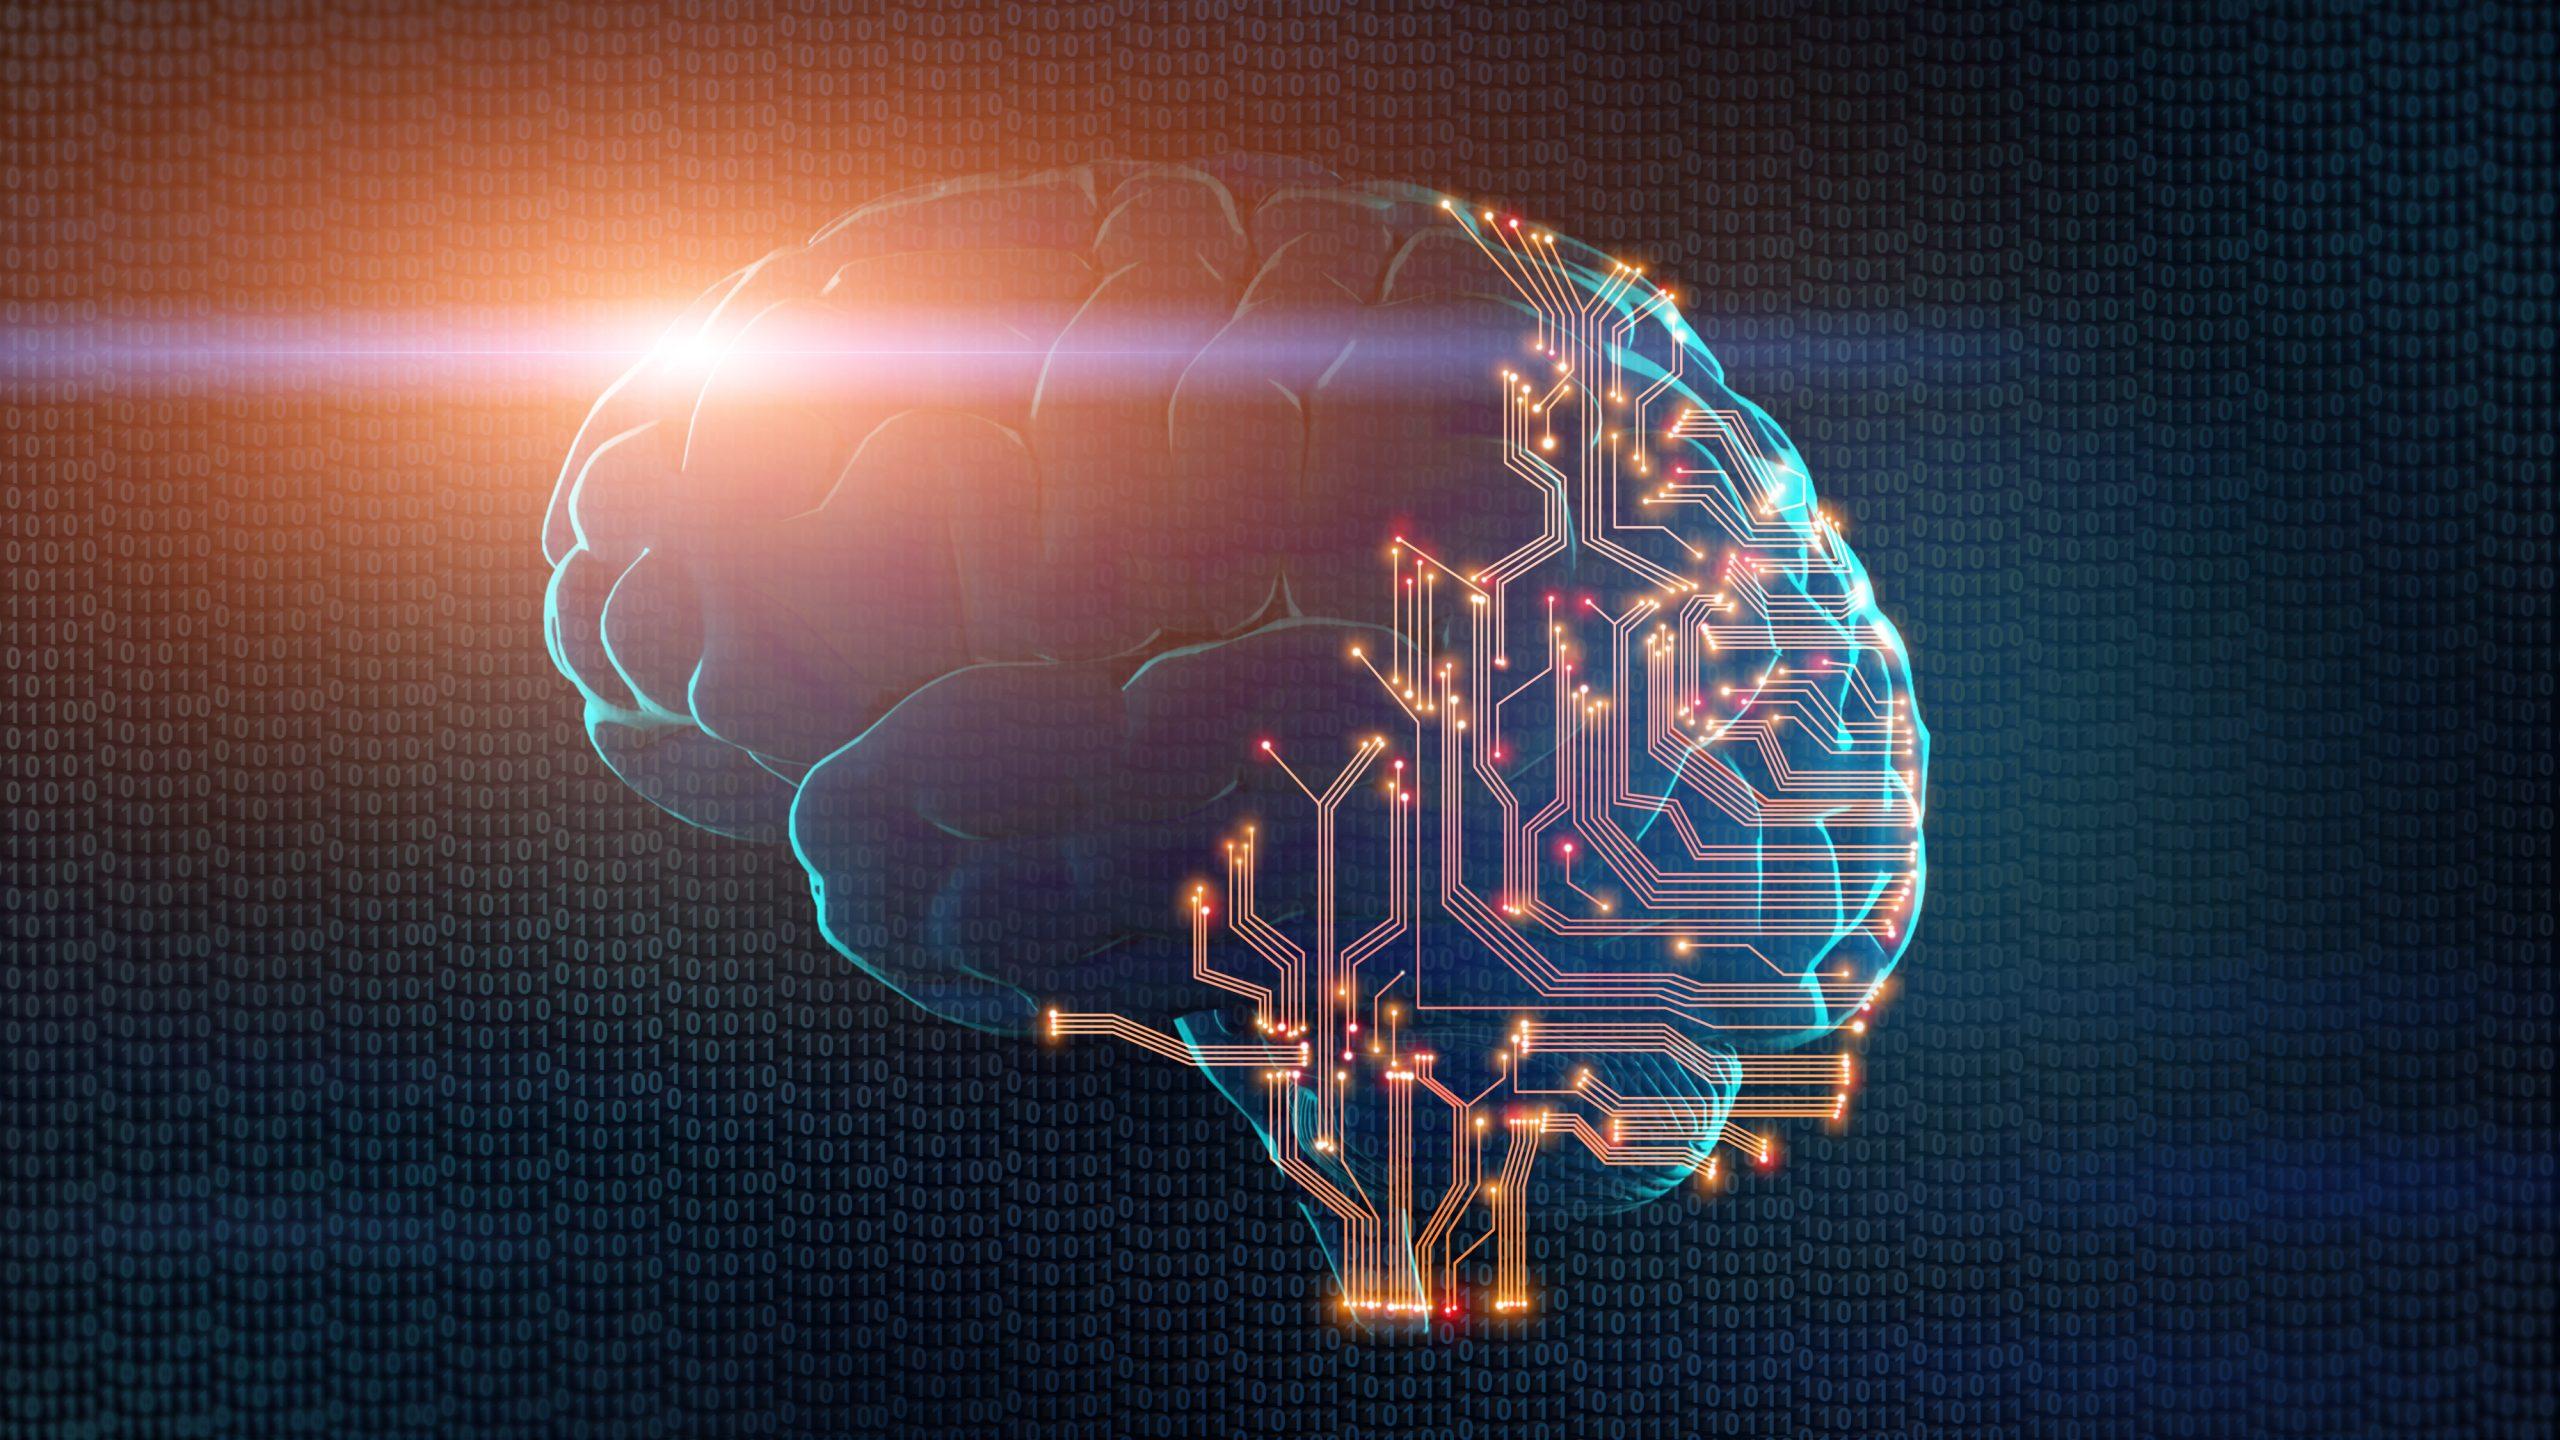 En hjerne som symboliserer teknologisk utvikling